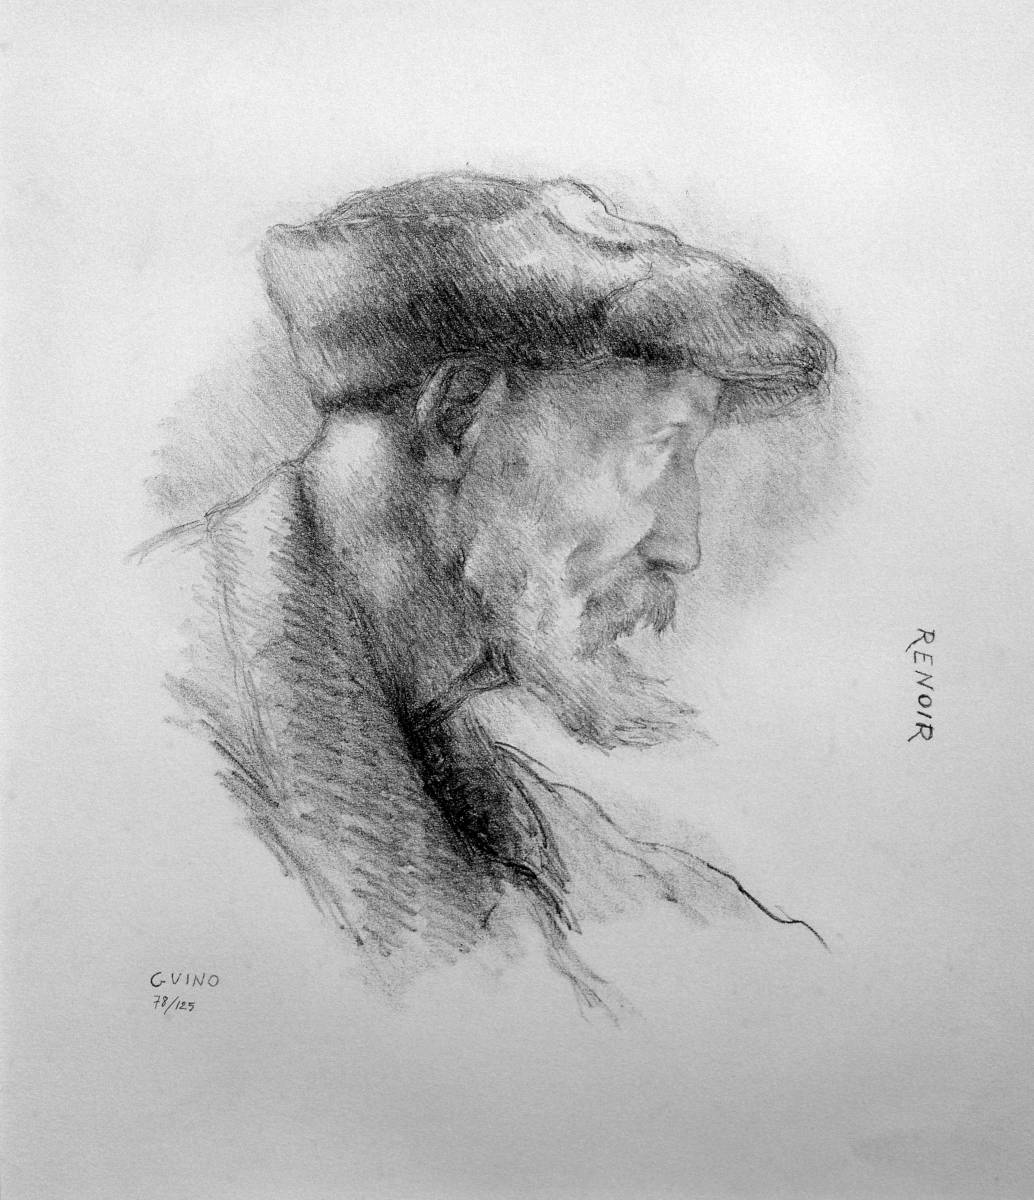 Renoir - Richard Guino, c. 1913